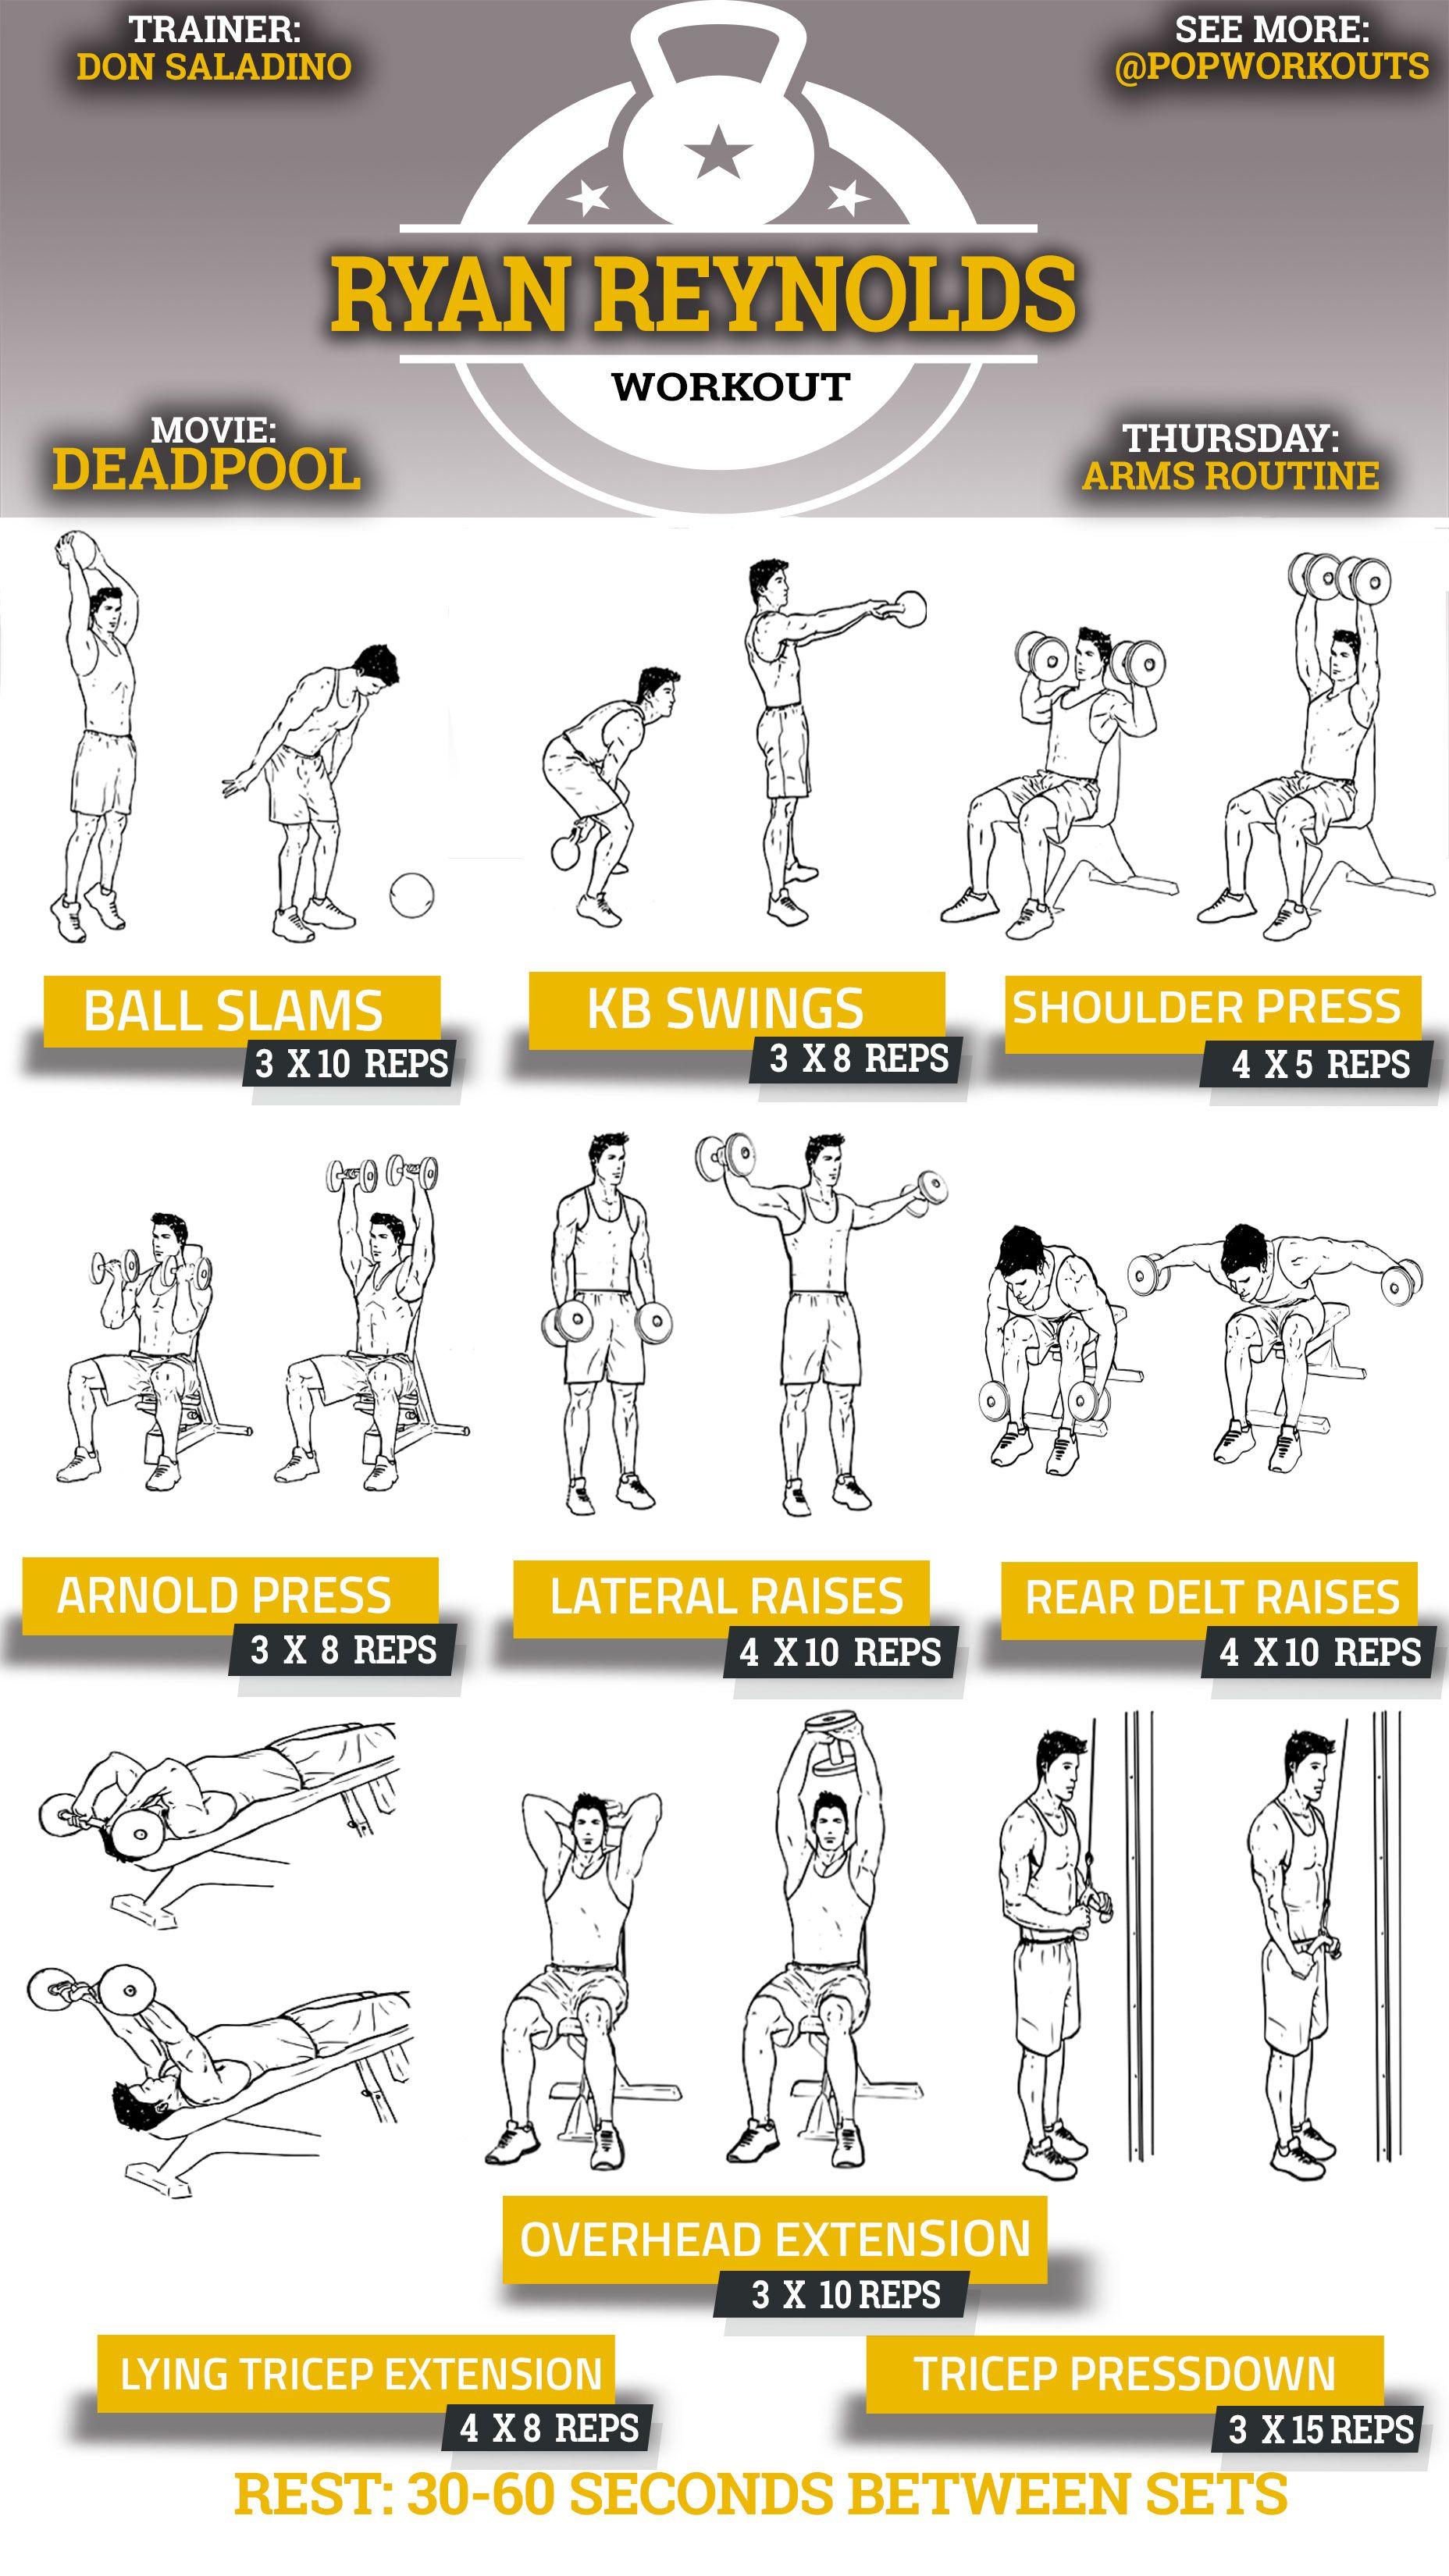 Ryan Reynolds Deadpool Routine Arms Workout Chart ...  Ryan Reynolds D...